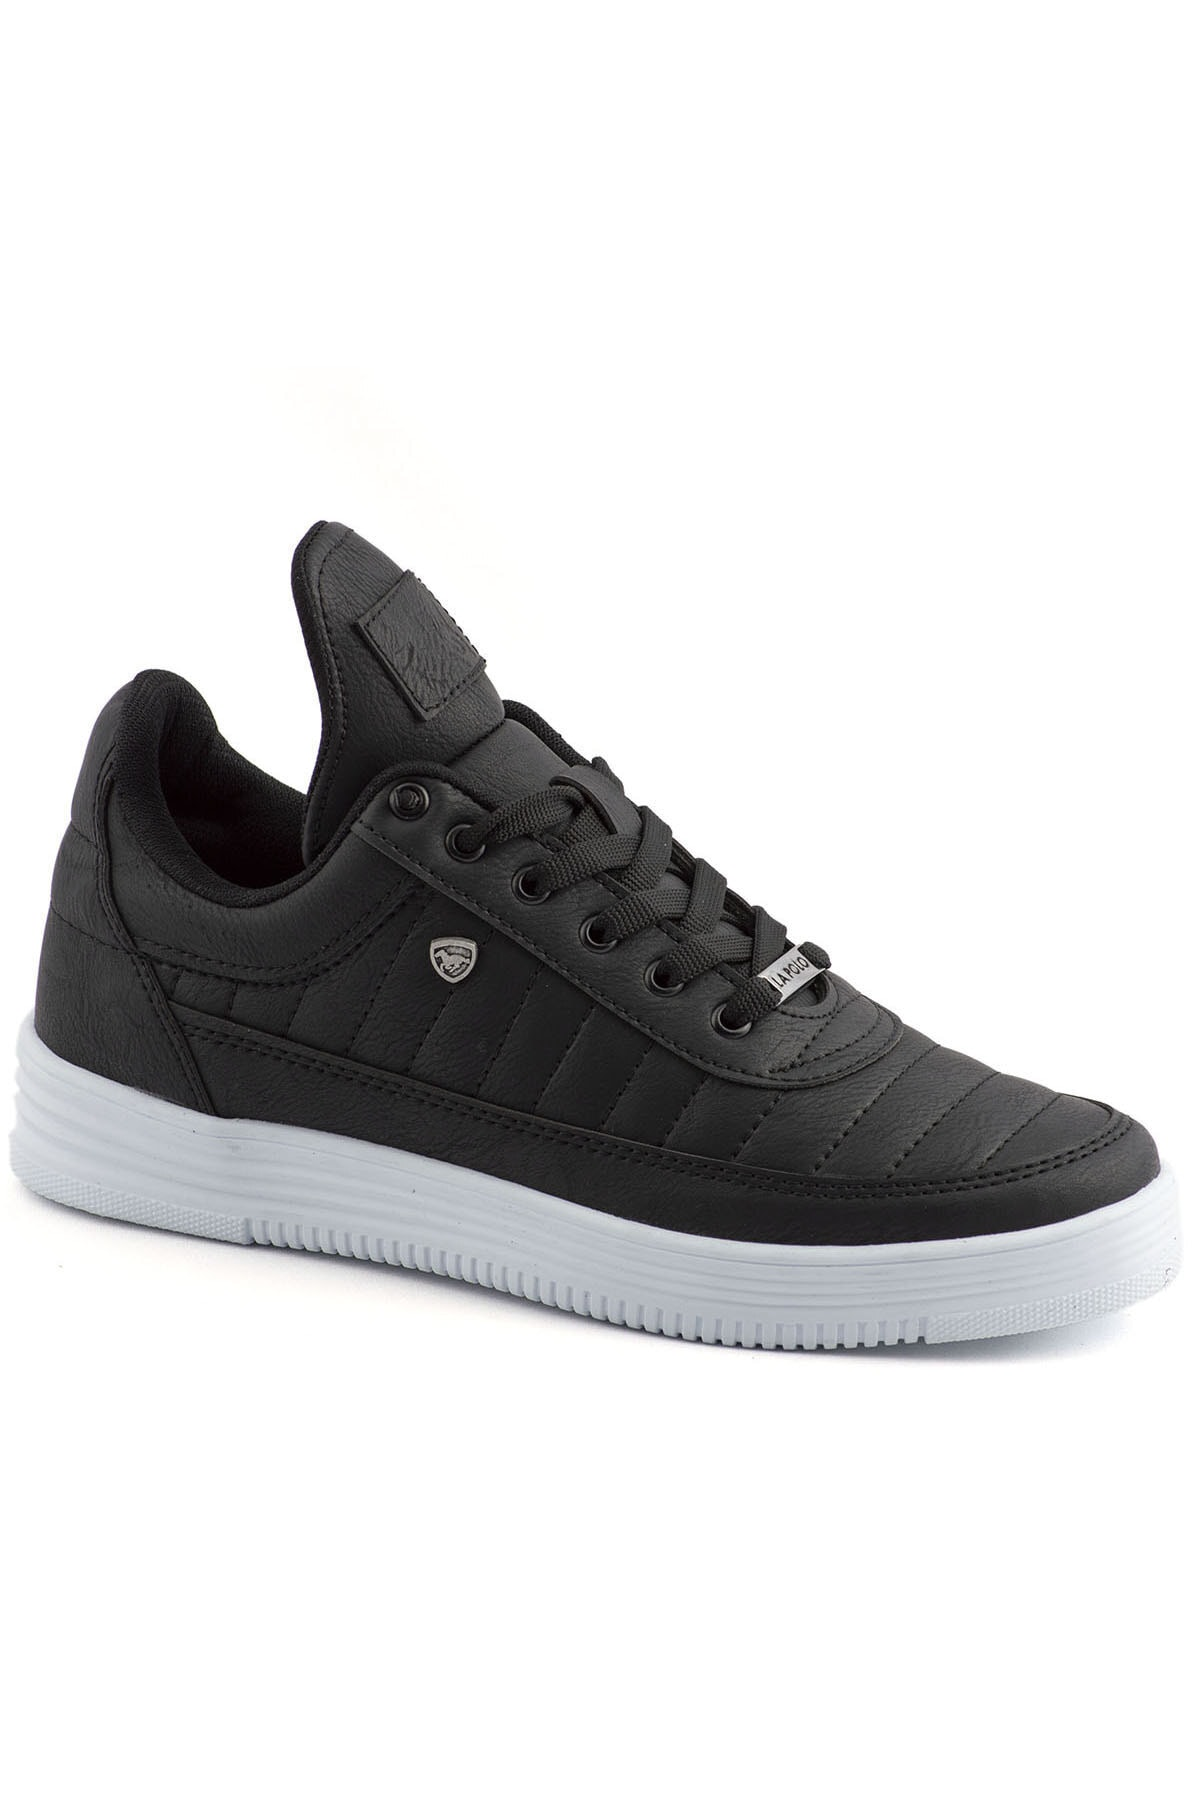 L.A Polo 07 Siyah Beyaz Dikişli Taban Unisex Spor Ayakkabı 1